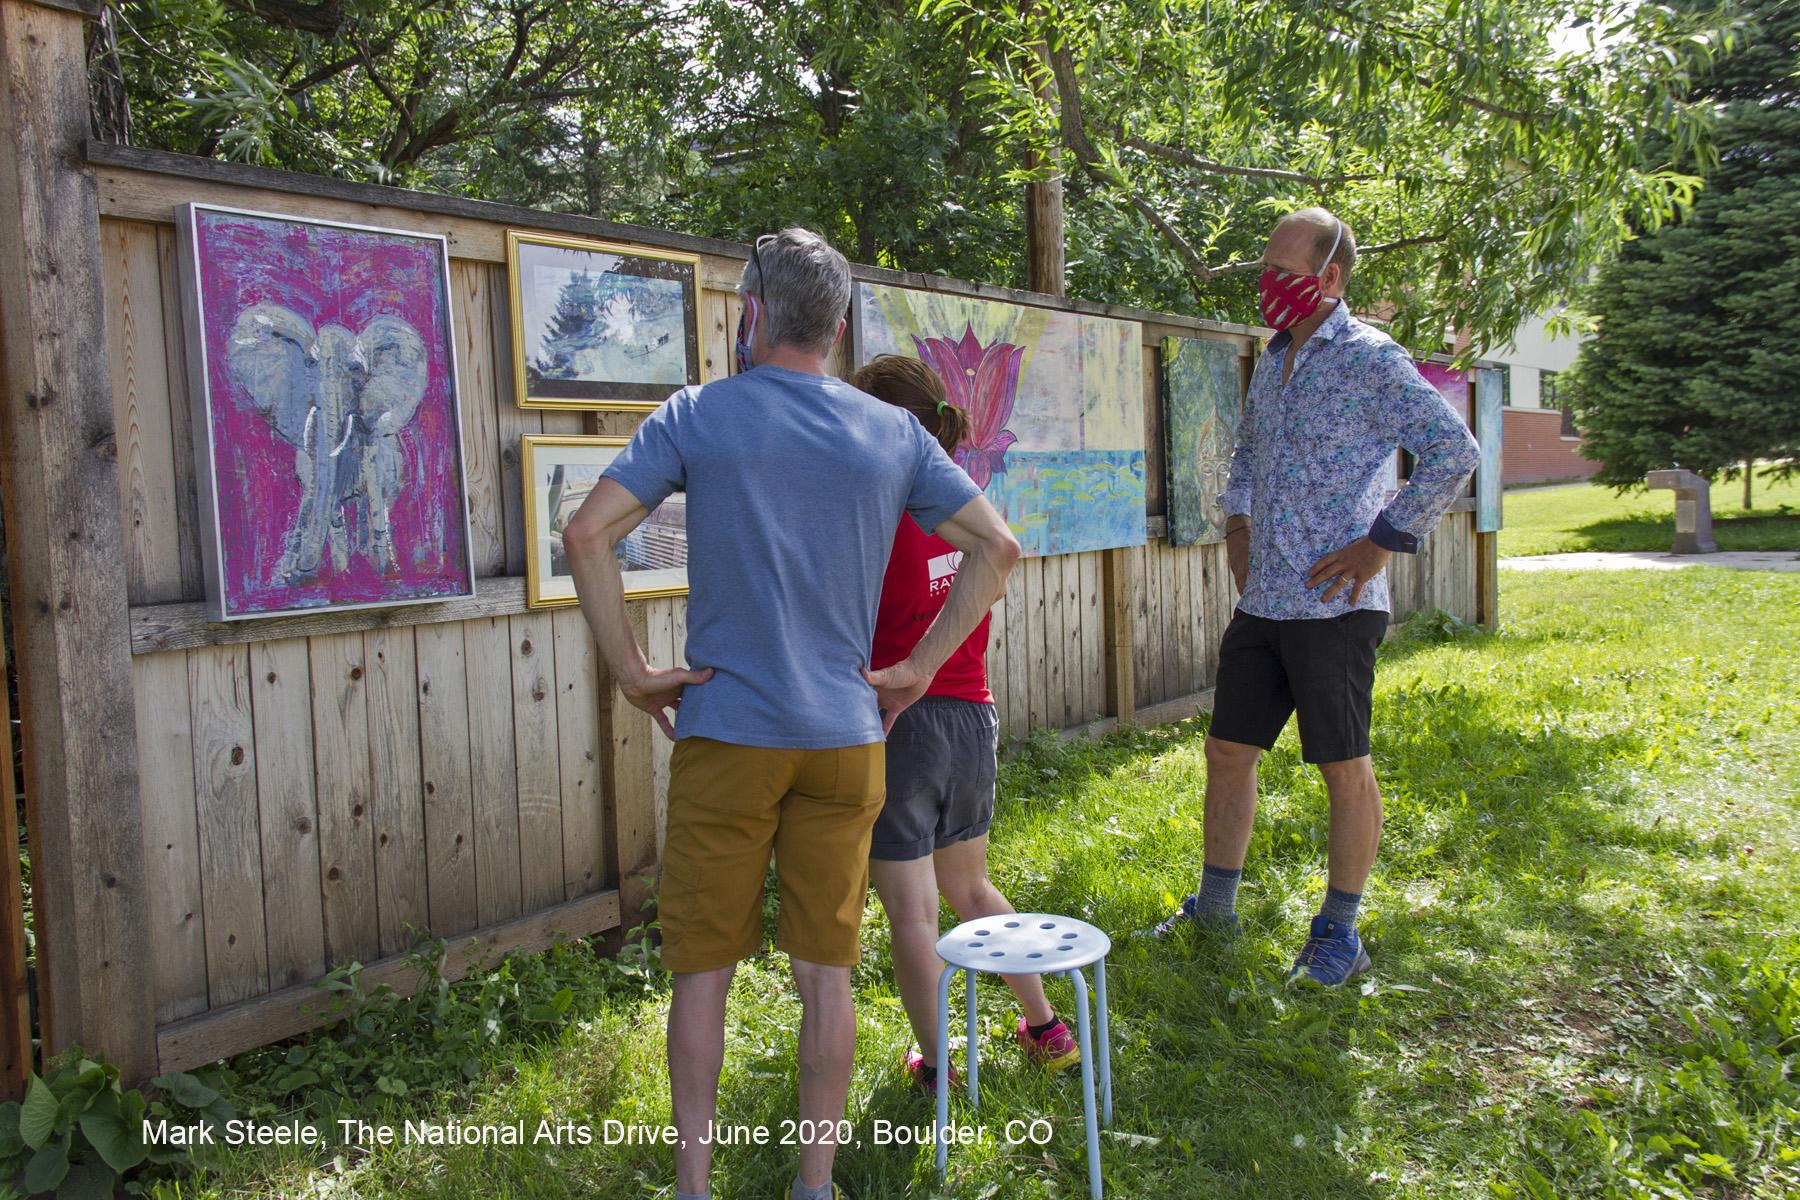 Joseph Jimenez & Mark Steele2275 Forest Avenue, Boulder